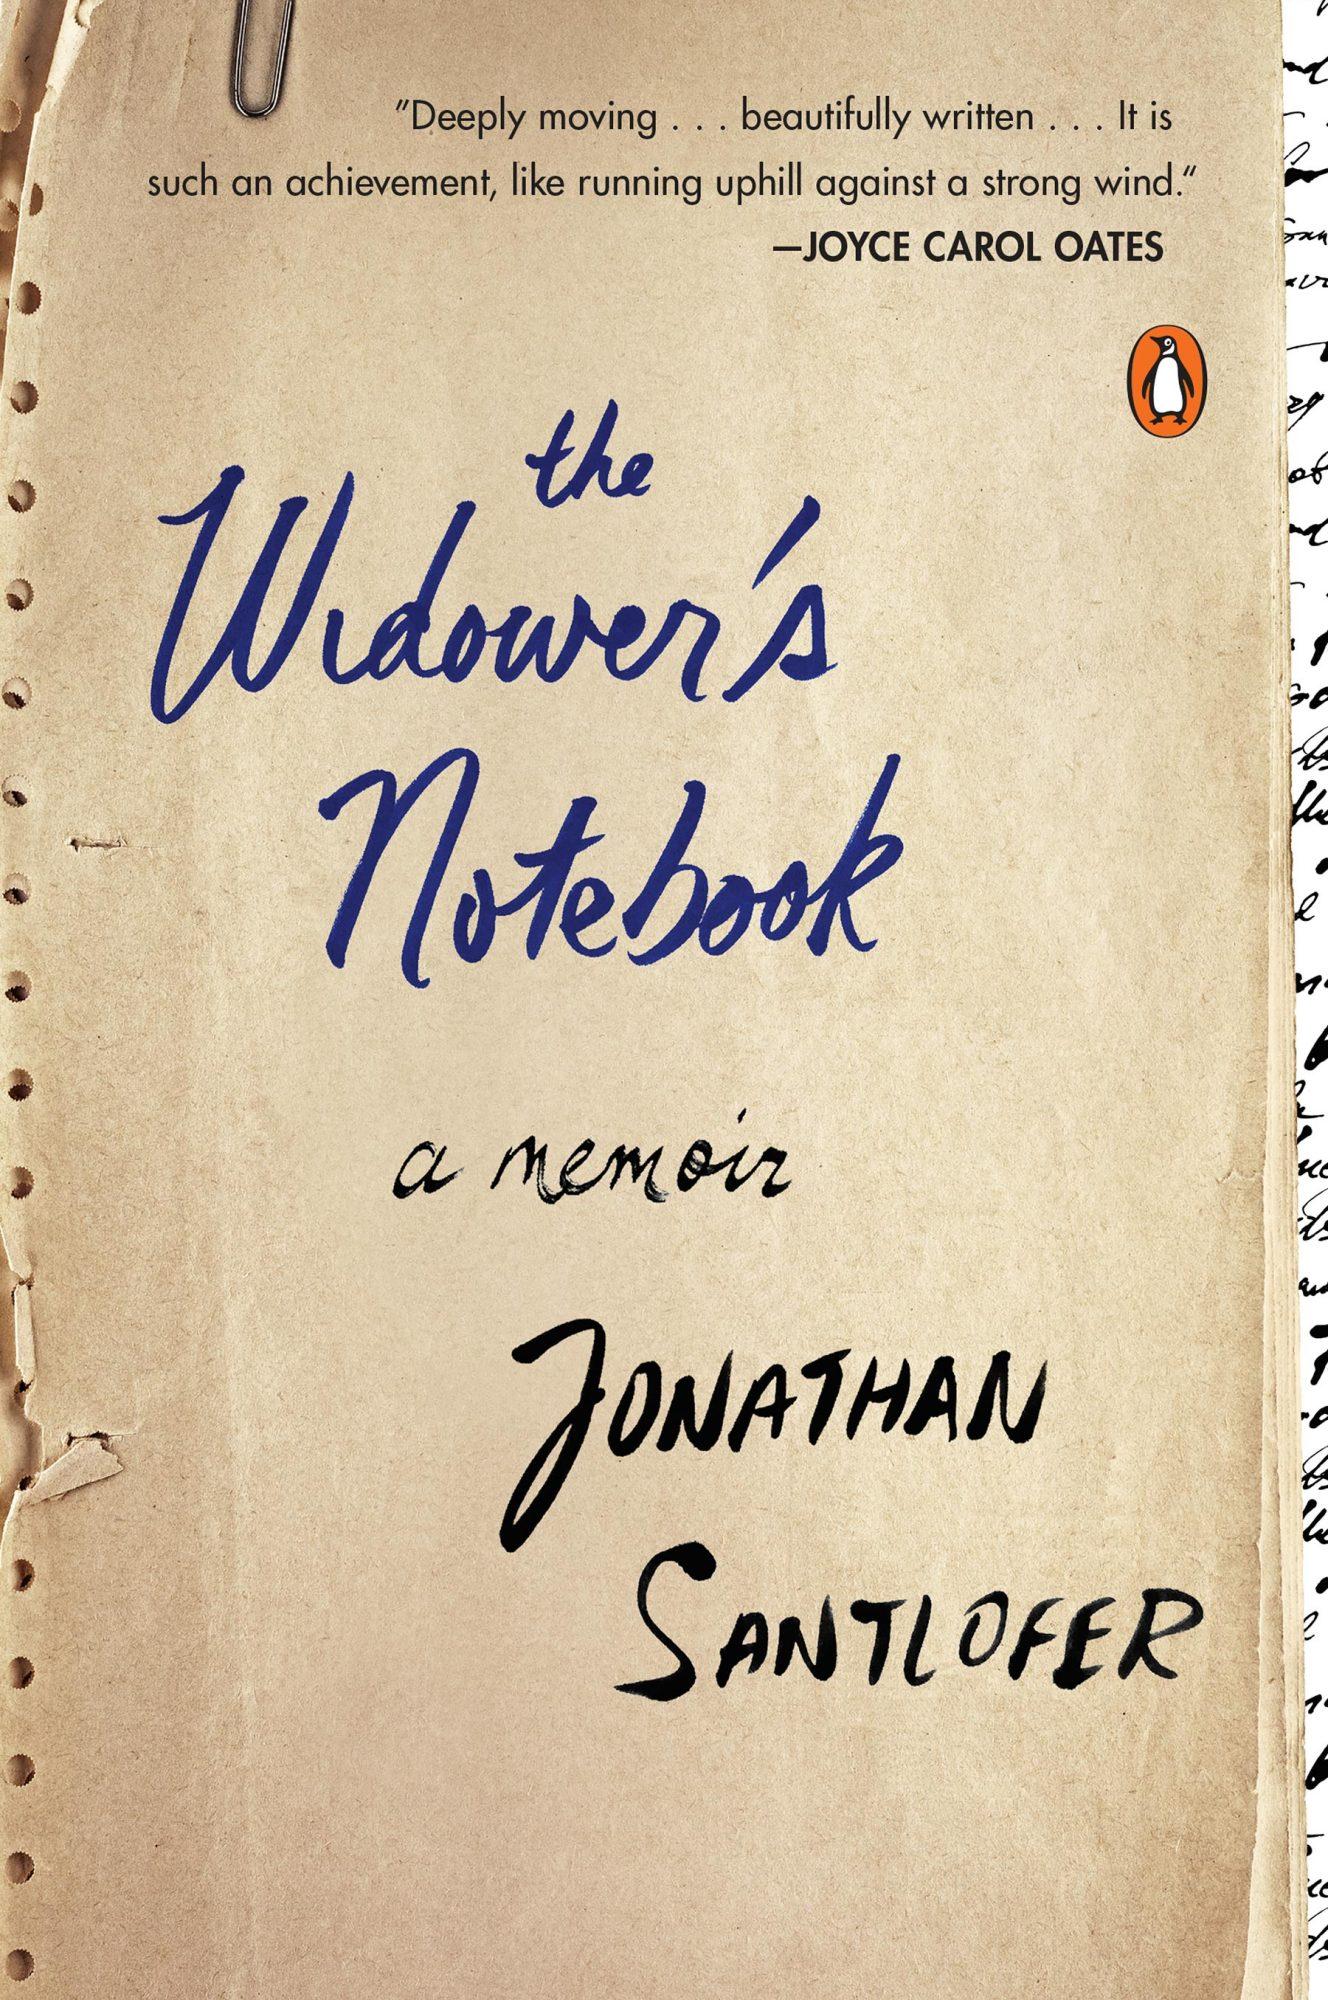 The Widower's NotebookA MEMOIRBy JONATHAN SANTLOFERCR: Alfred A. Knopf